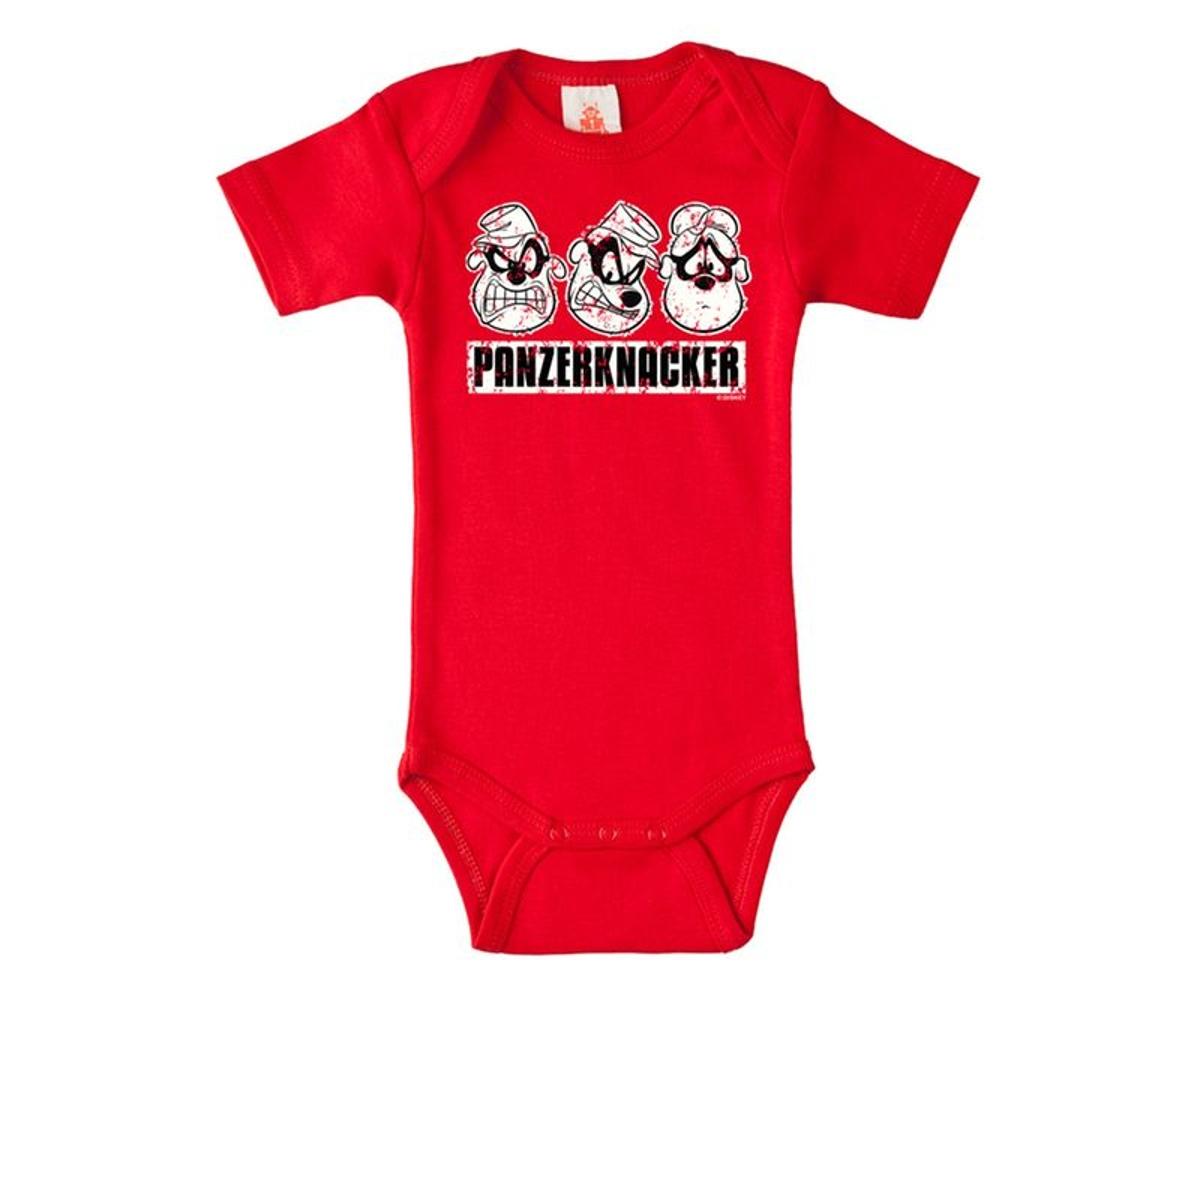 Body bébé Panzerknacker - Disney